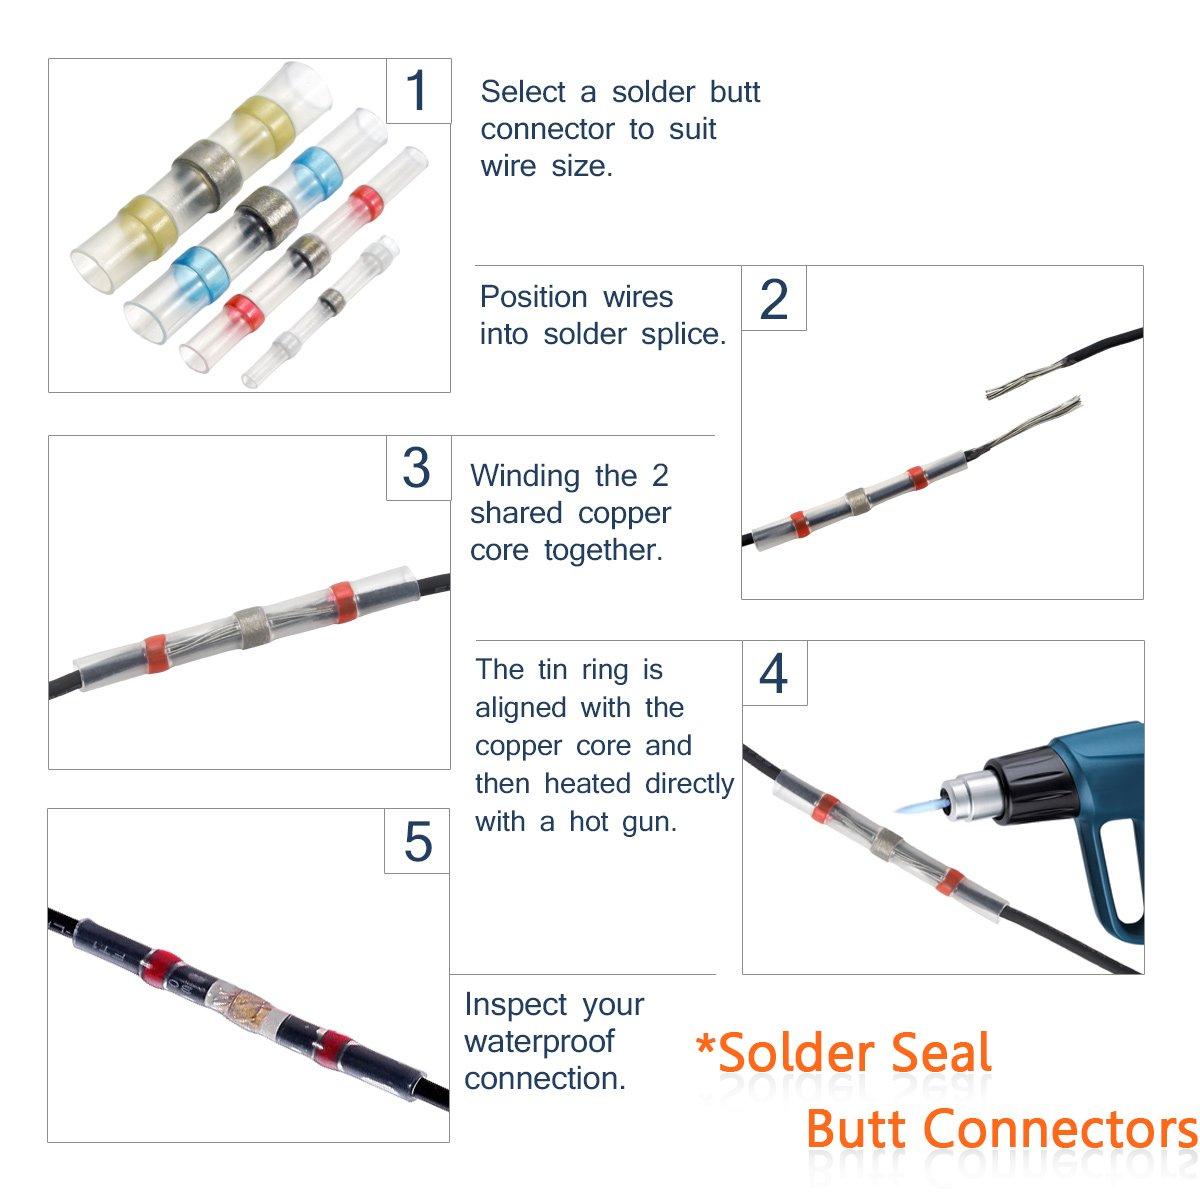 210Pcs Heat Shrink Wire Connectors Solder Seal Wire Connectors ...